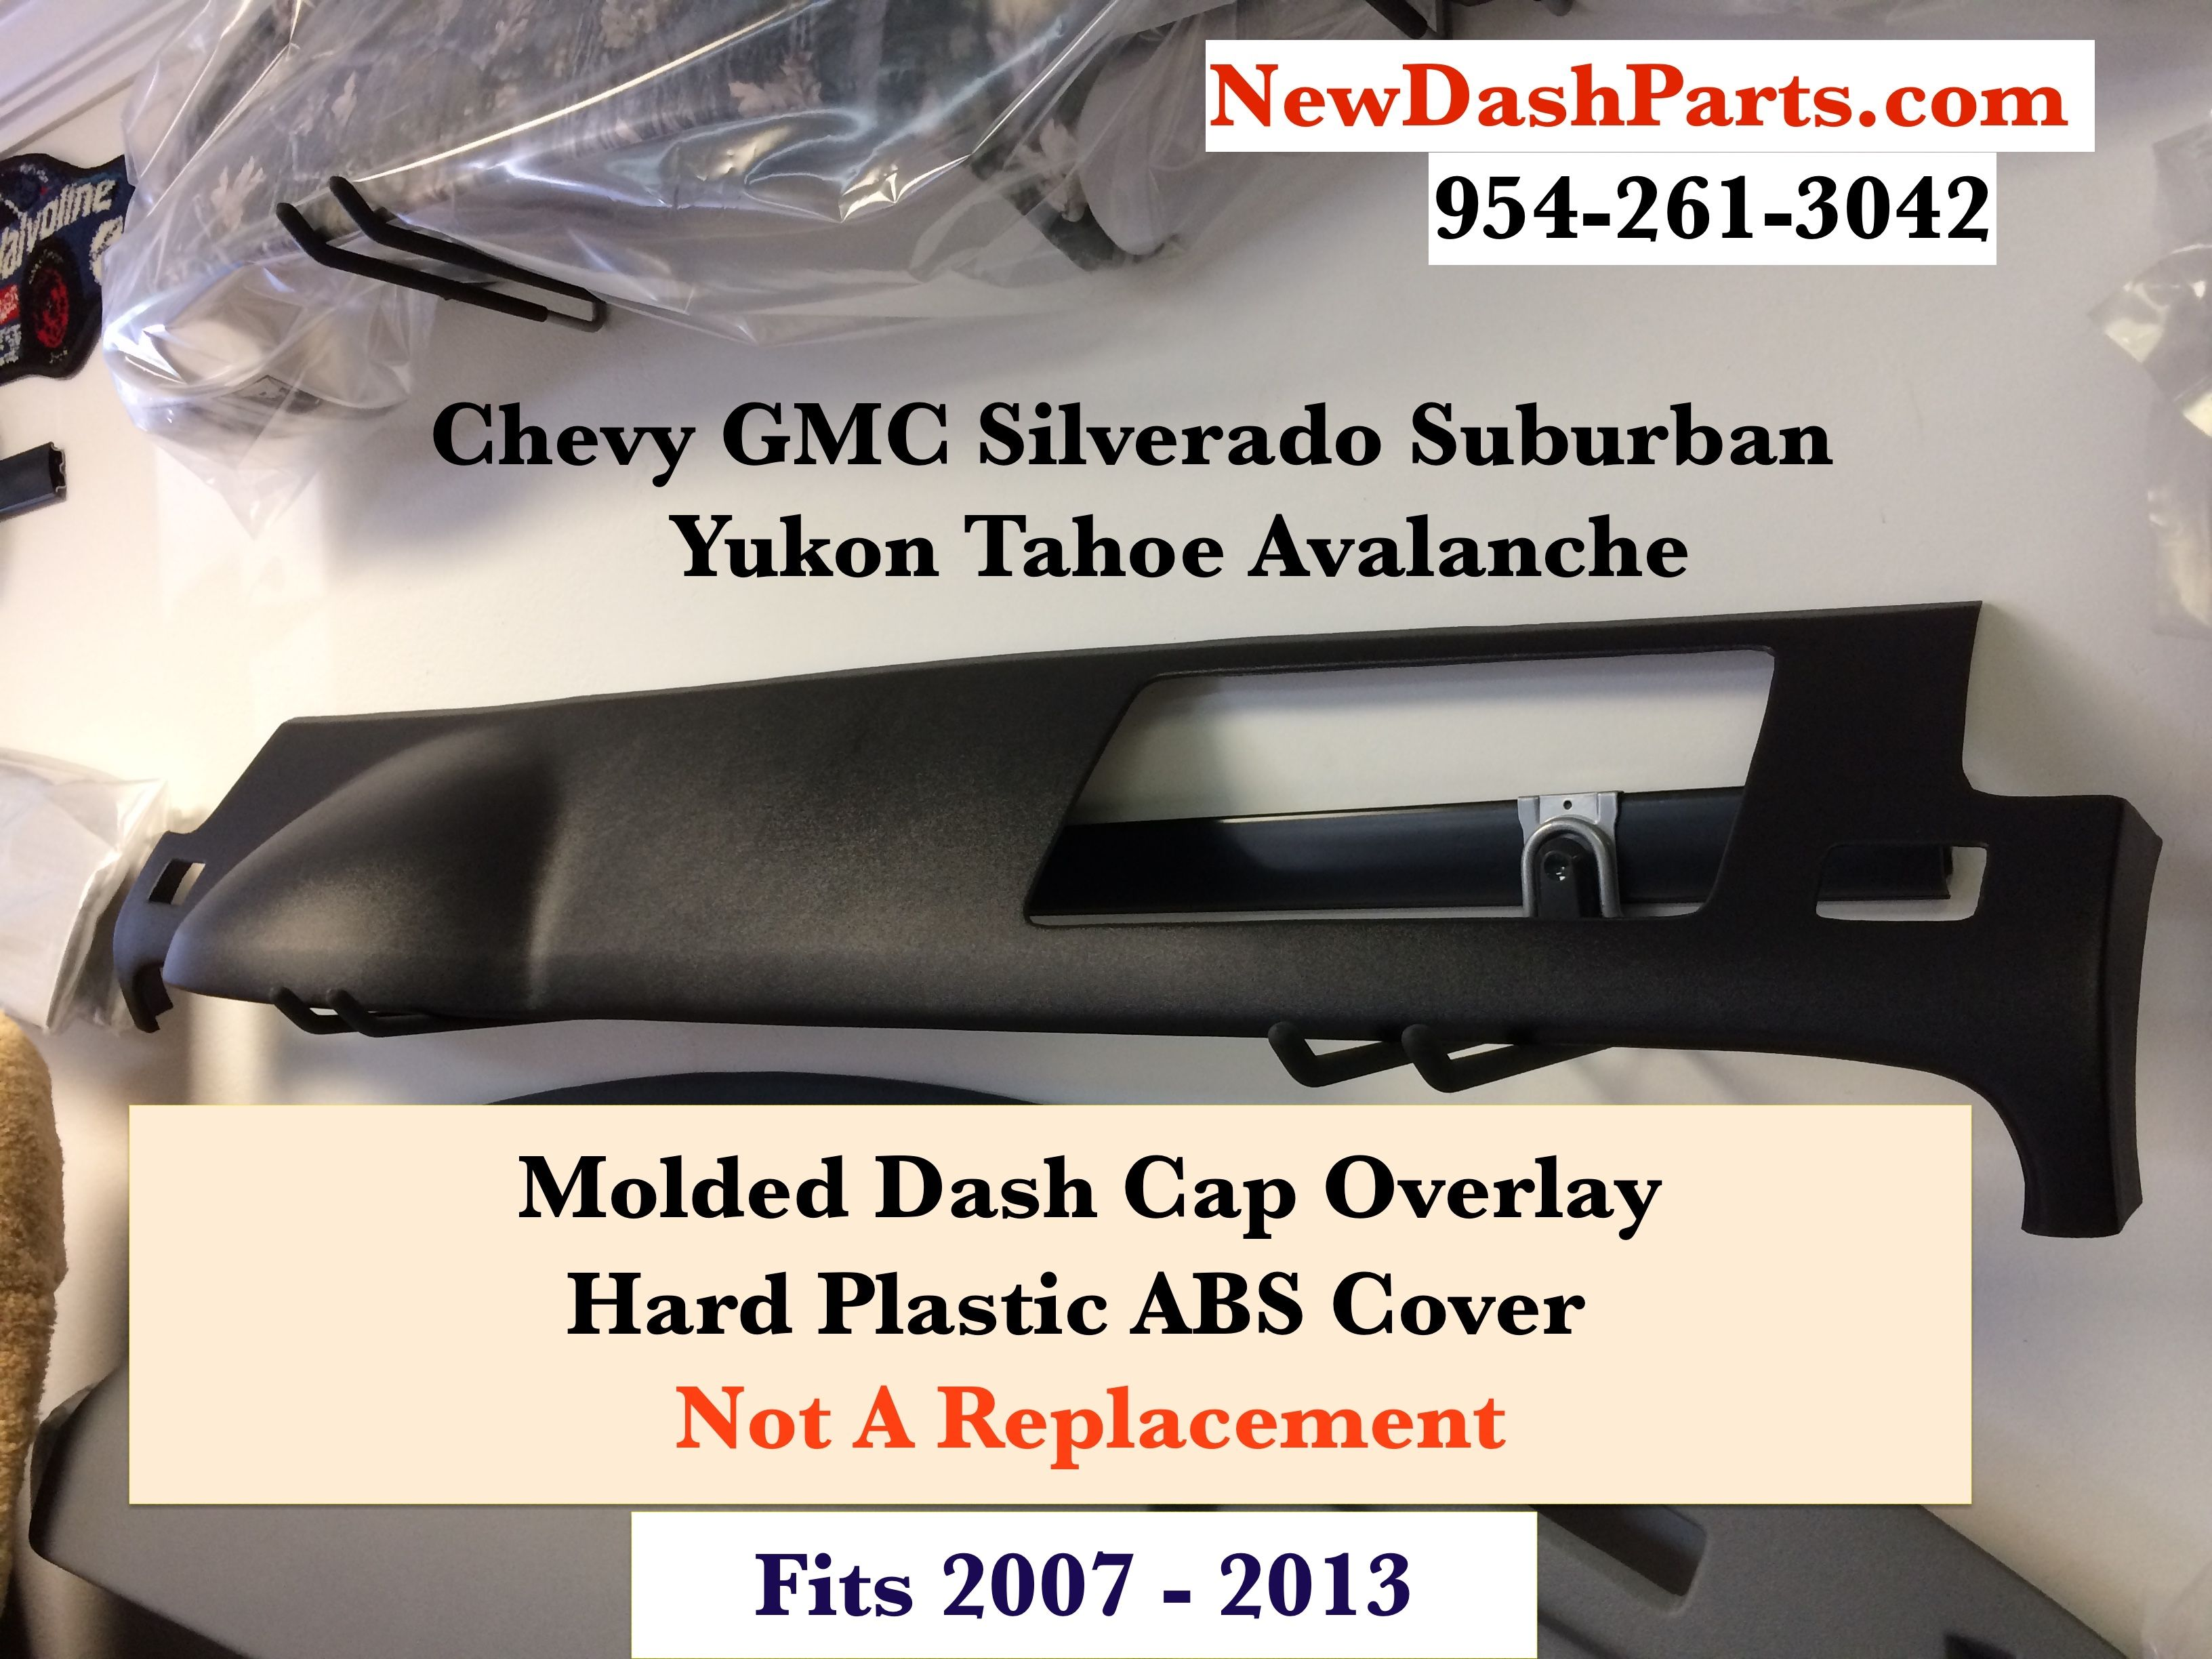 Chevy Gmc Suburban Yukon Denali Tahoe Avalanche Dash Cap Overlay Hard Cover Call Jane 954 261 3042 For Istance